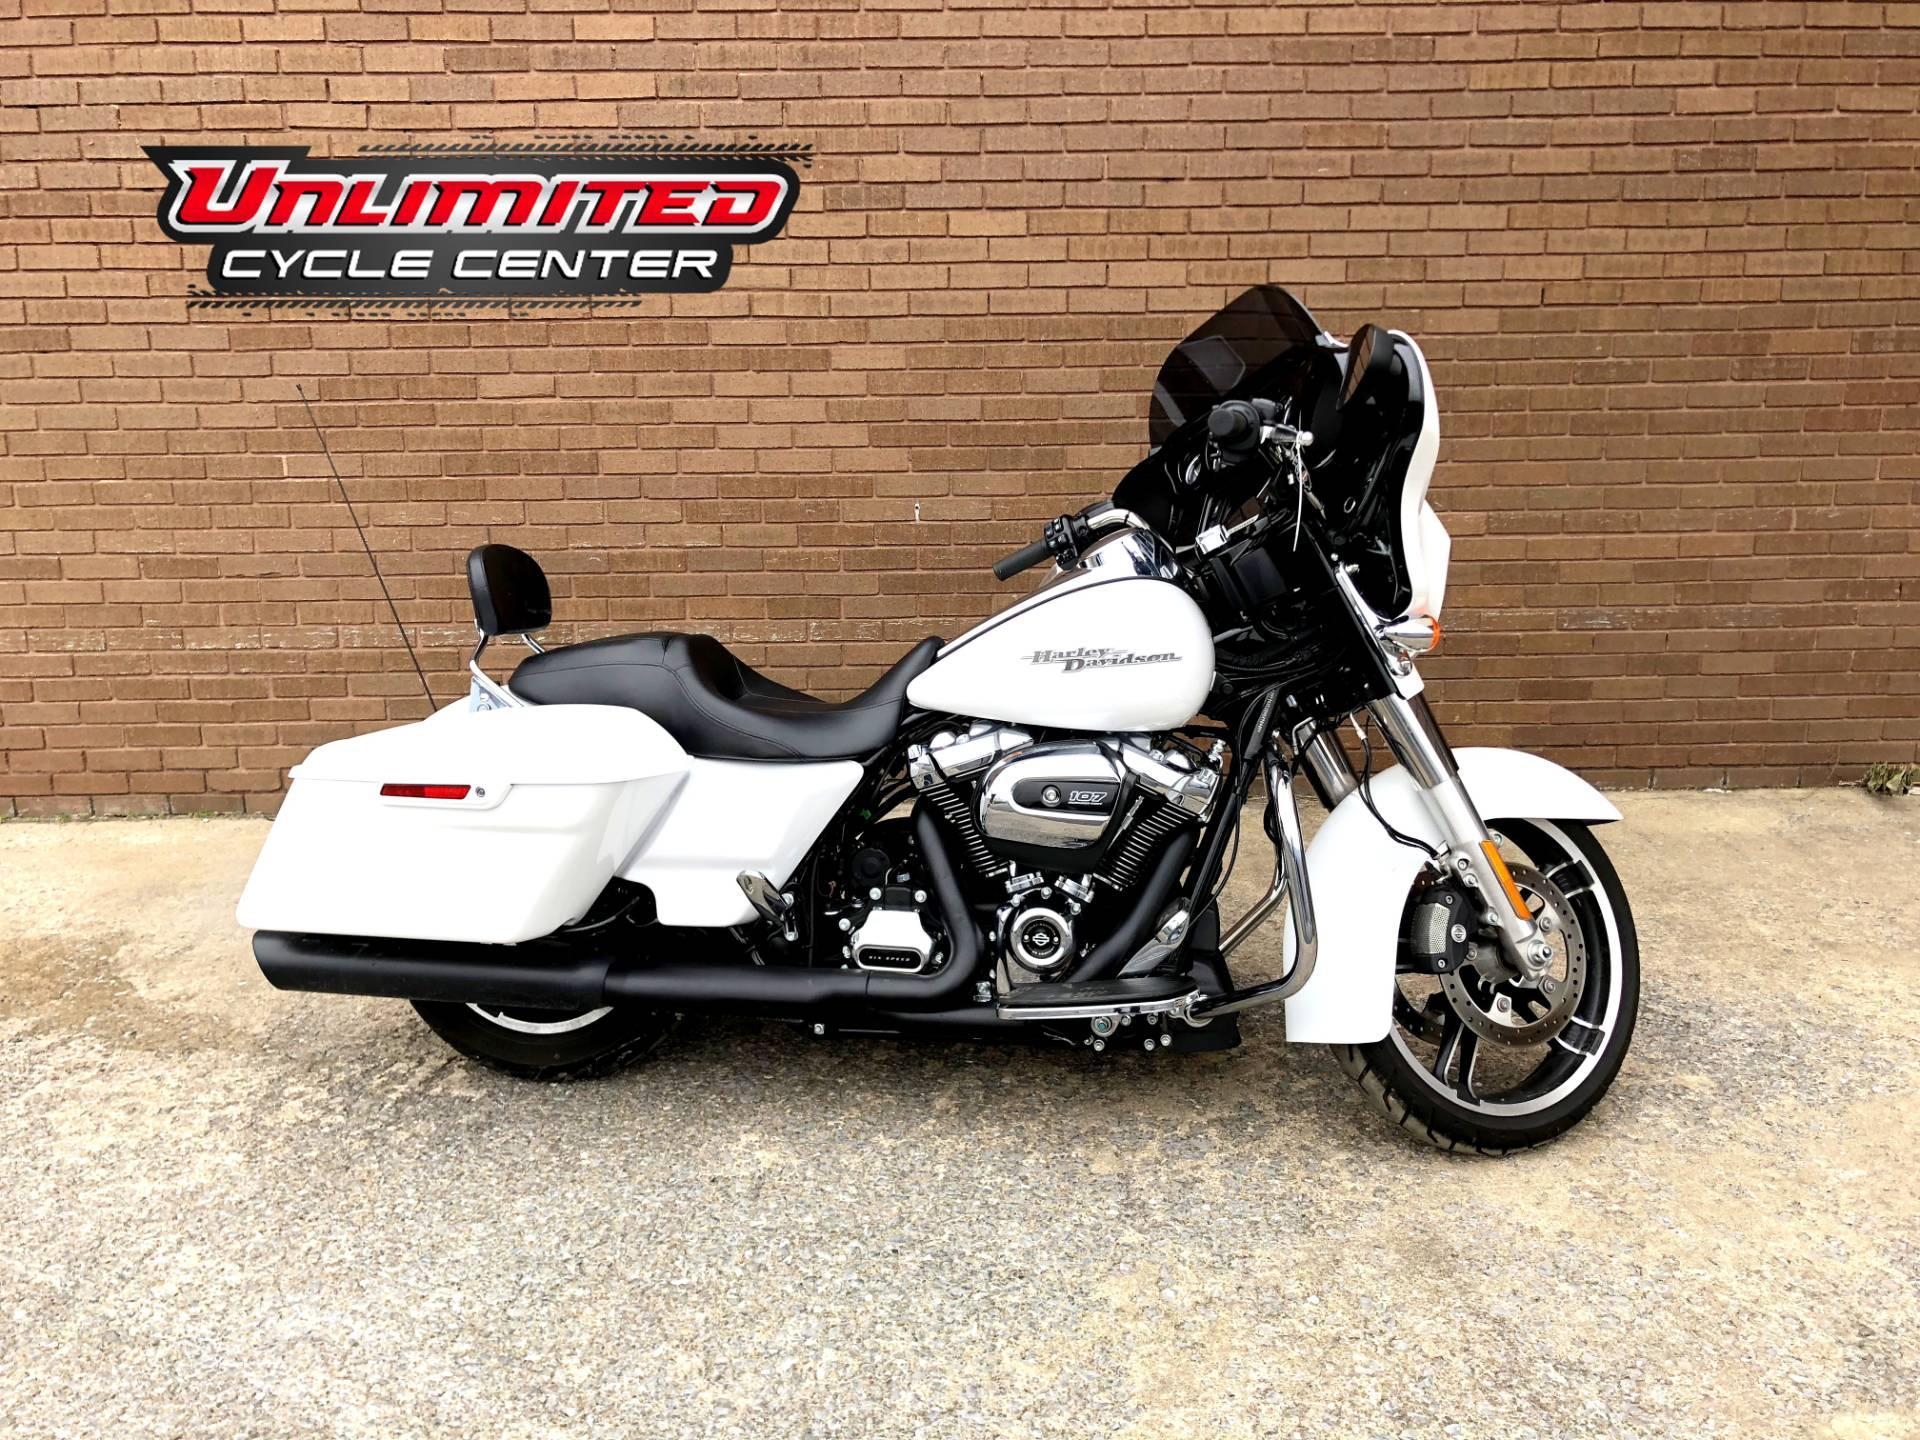 2017 Harley-Davidson Street Glide® Special in Tyrone, Pennsylvania